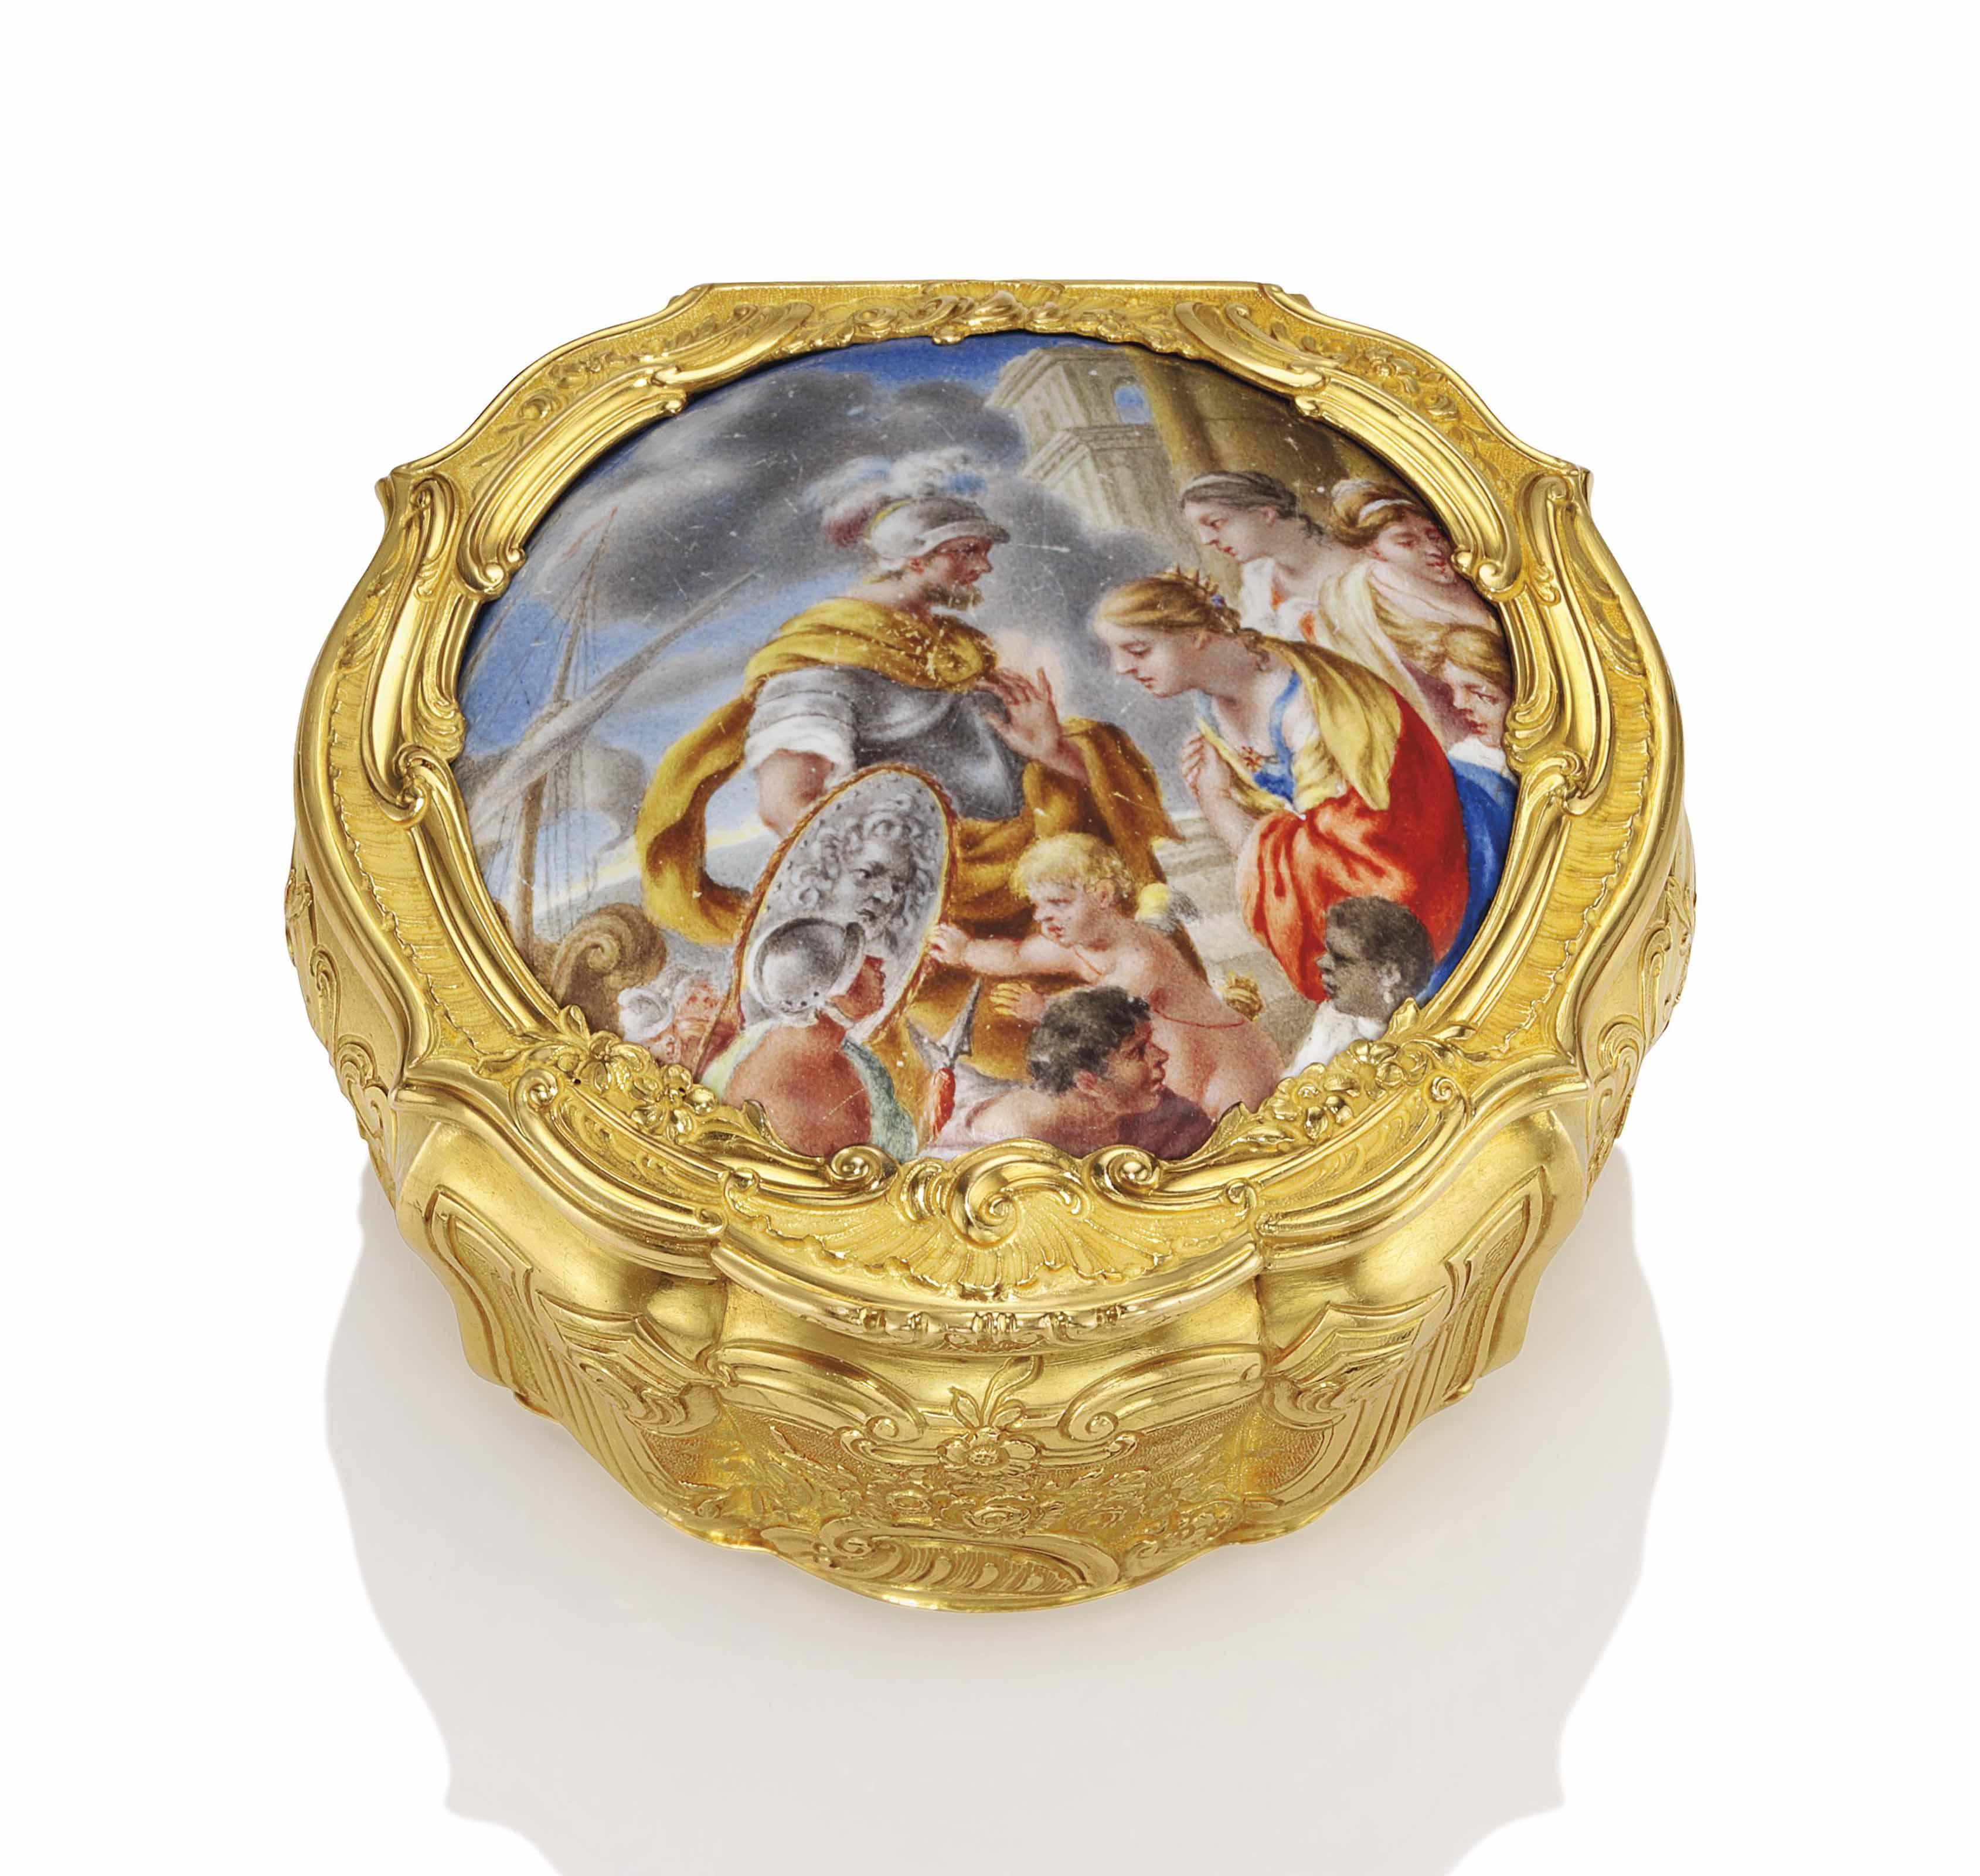 A GEORGE III GOLD SNUFF-BOX SE